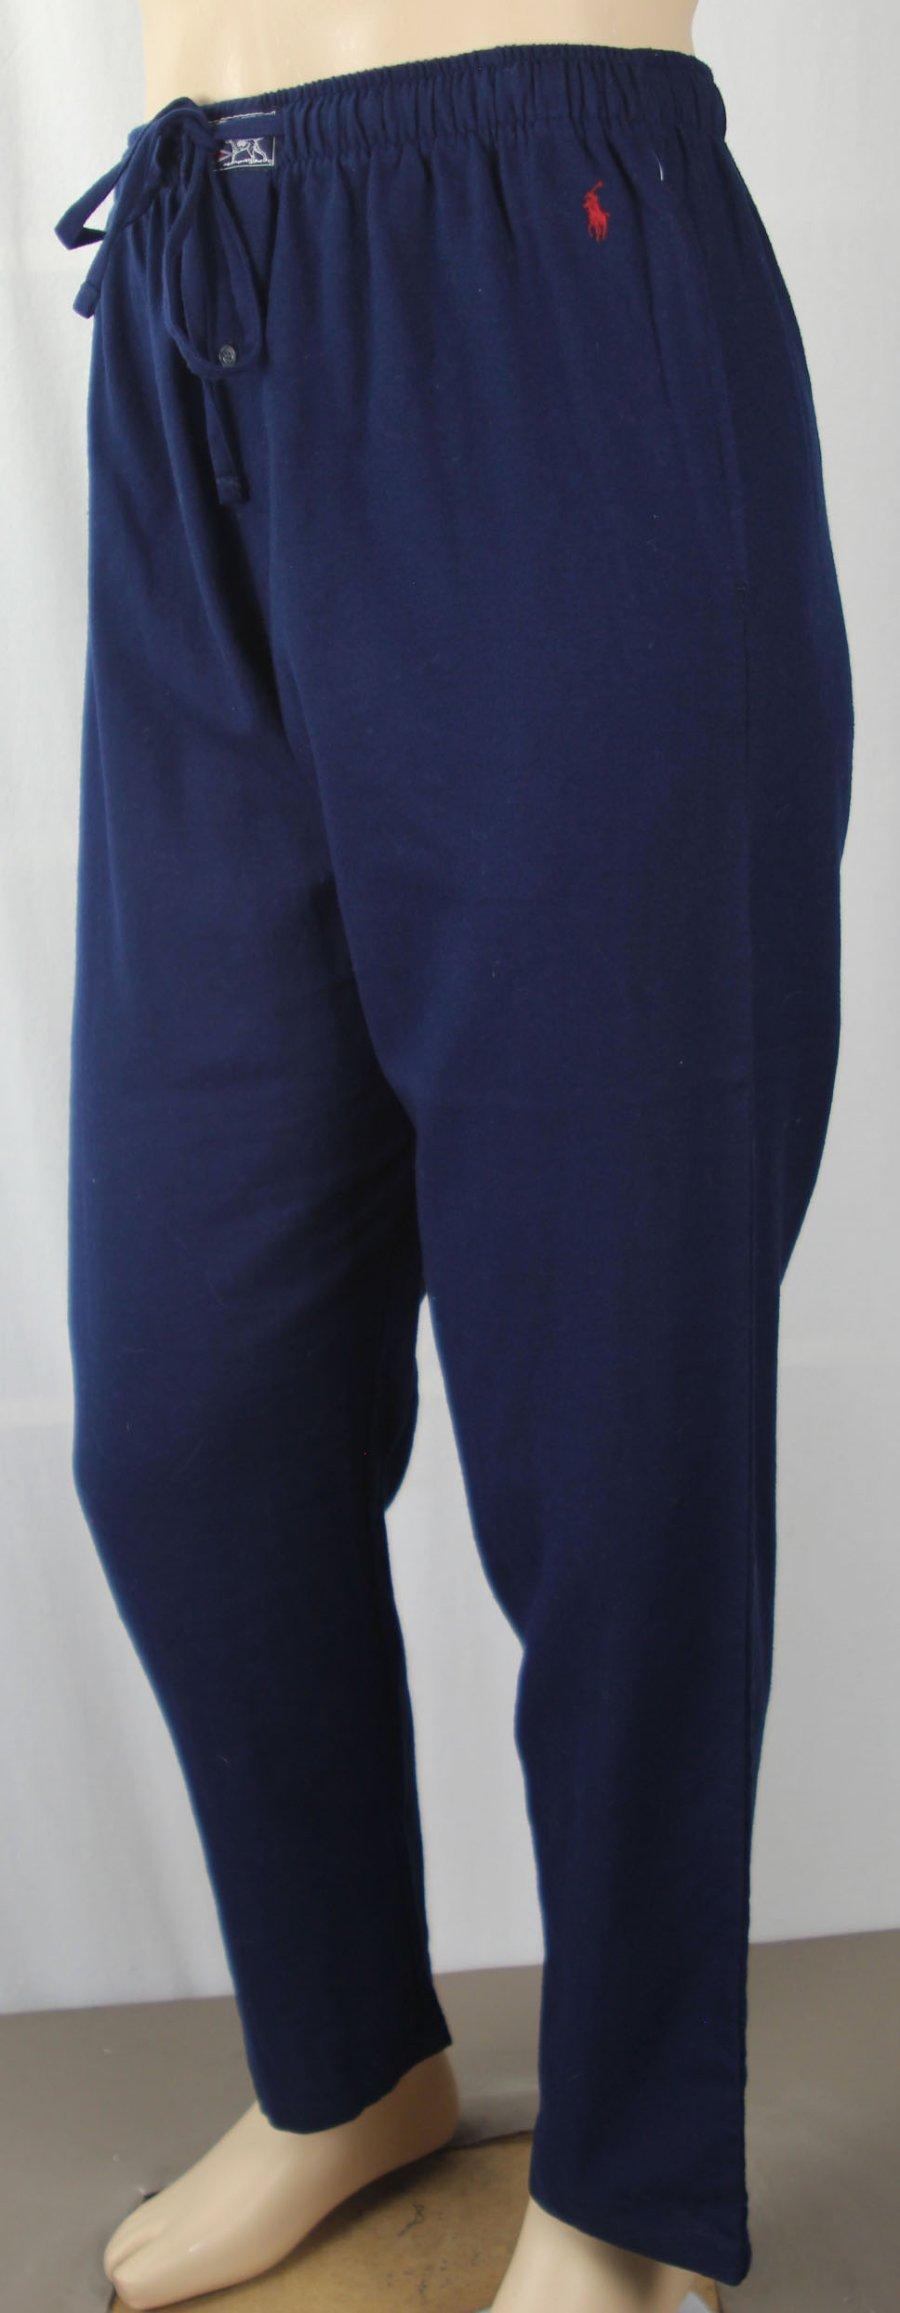 brand new 010eb 31b8e Herrenmode Nachtwäsche POLO Ralph Lauren Navy Blue Pajamas ...